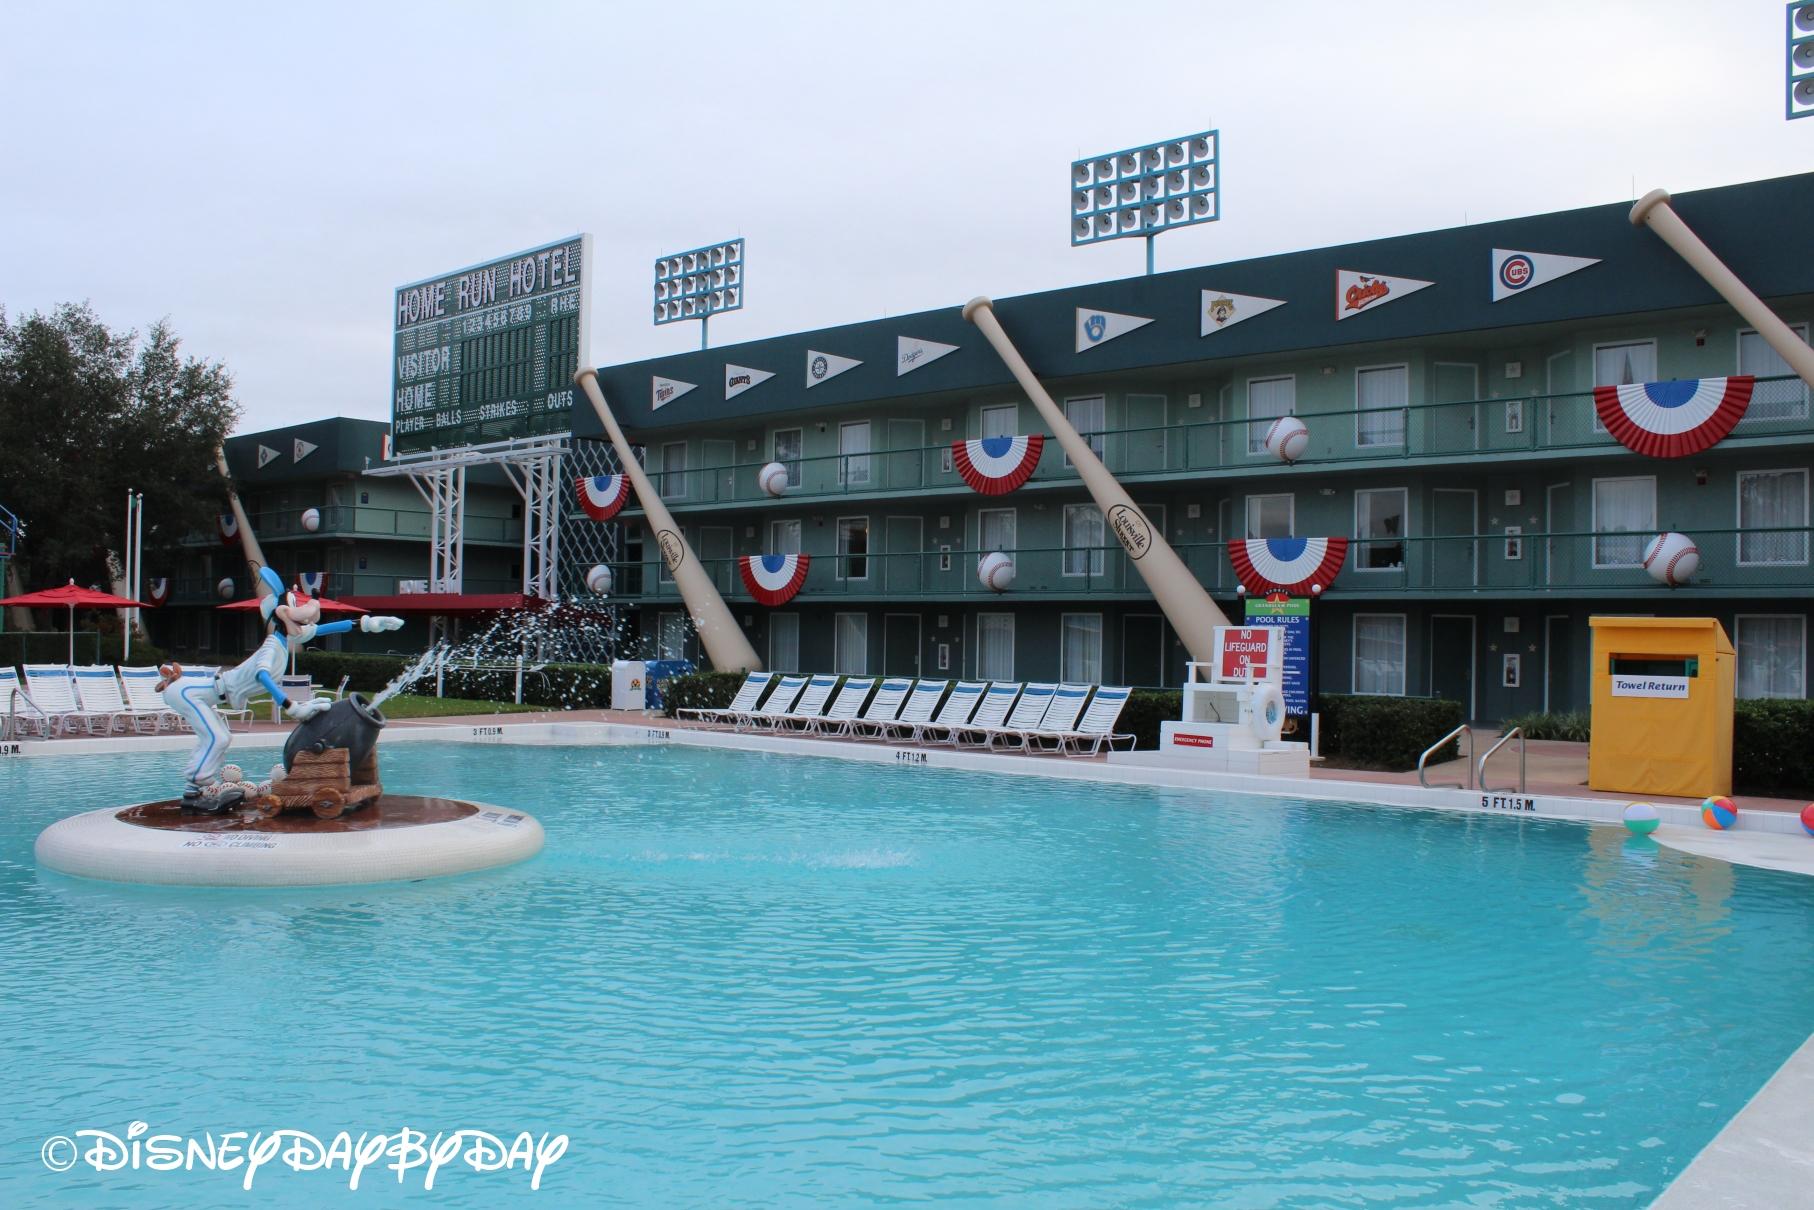 Disney World Lodging All Star Sports Resort Disneydaybyday